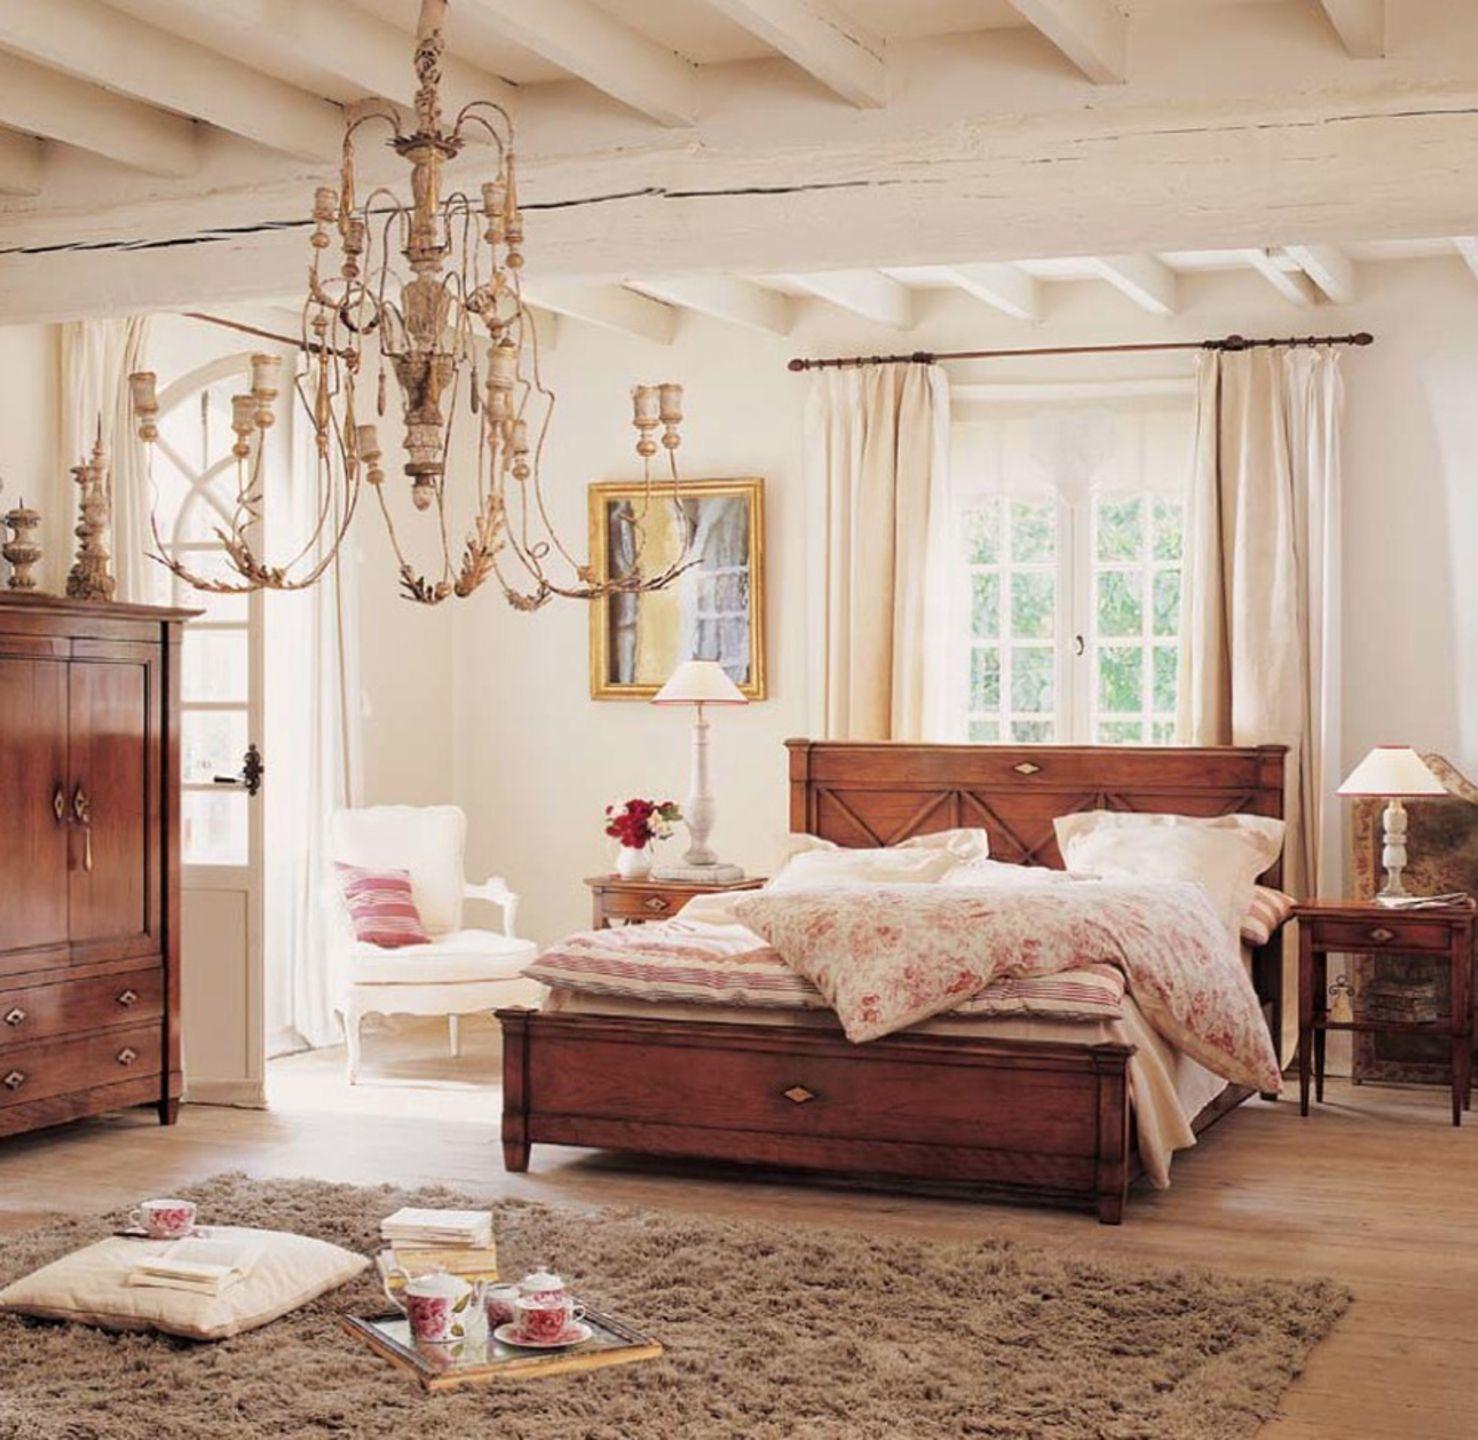 httpwwwinteriordevcomresodir1920x1440 modern classic vintage bedroom ideas beautiful chandelier wood cabinetjpg httpwwwinteriordevcomresodir1920x1440 modern classic vintage